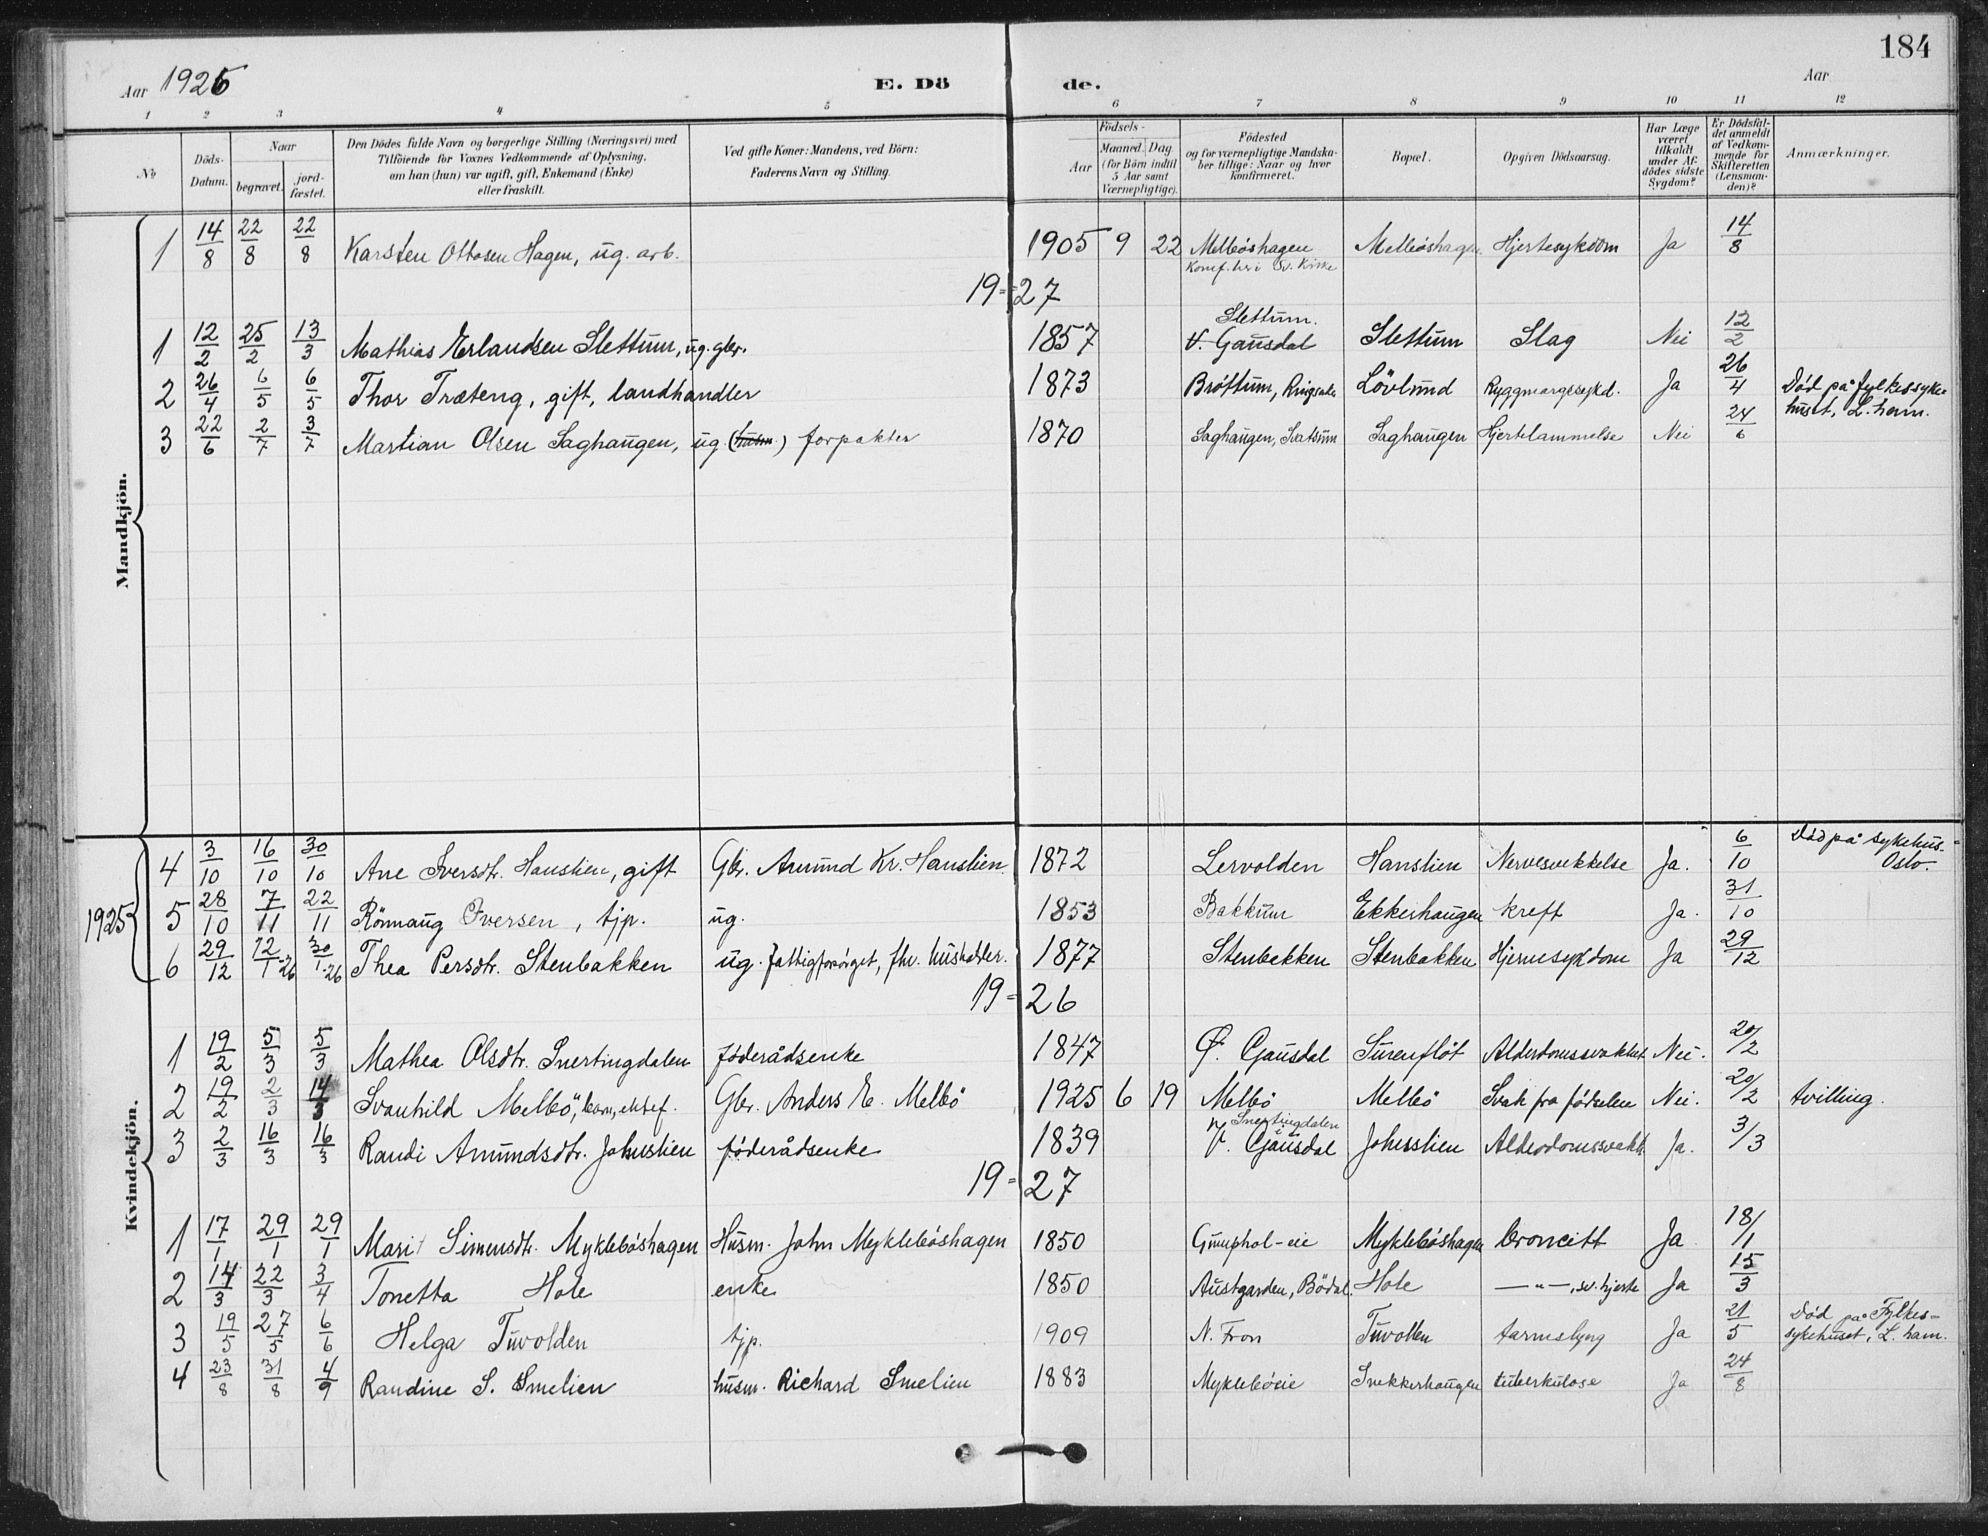 SAH, Vestre Gausdal prestekontor, Klokkerbok nr. 4, 1898-1939, s. 184